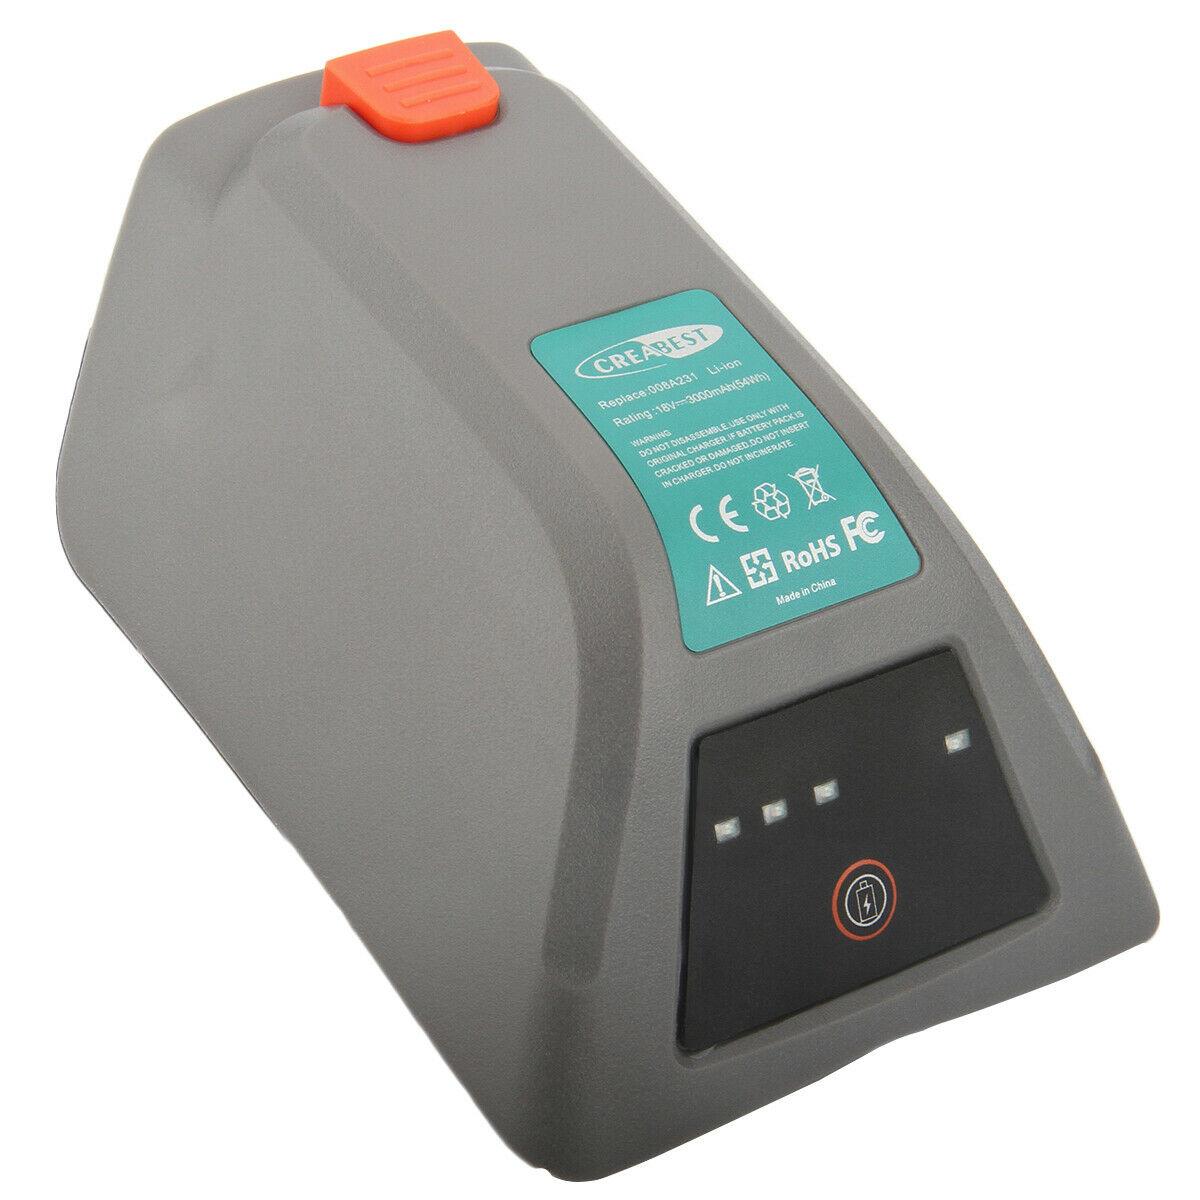 Batterie 008A231 08025-00.900.07 for Gardena (3Ah) (compatible)